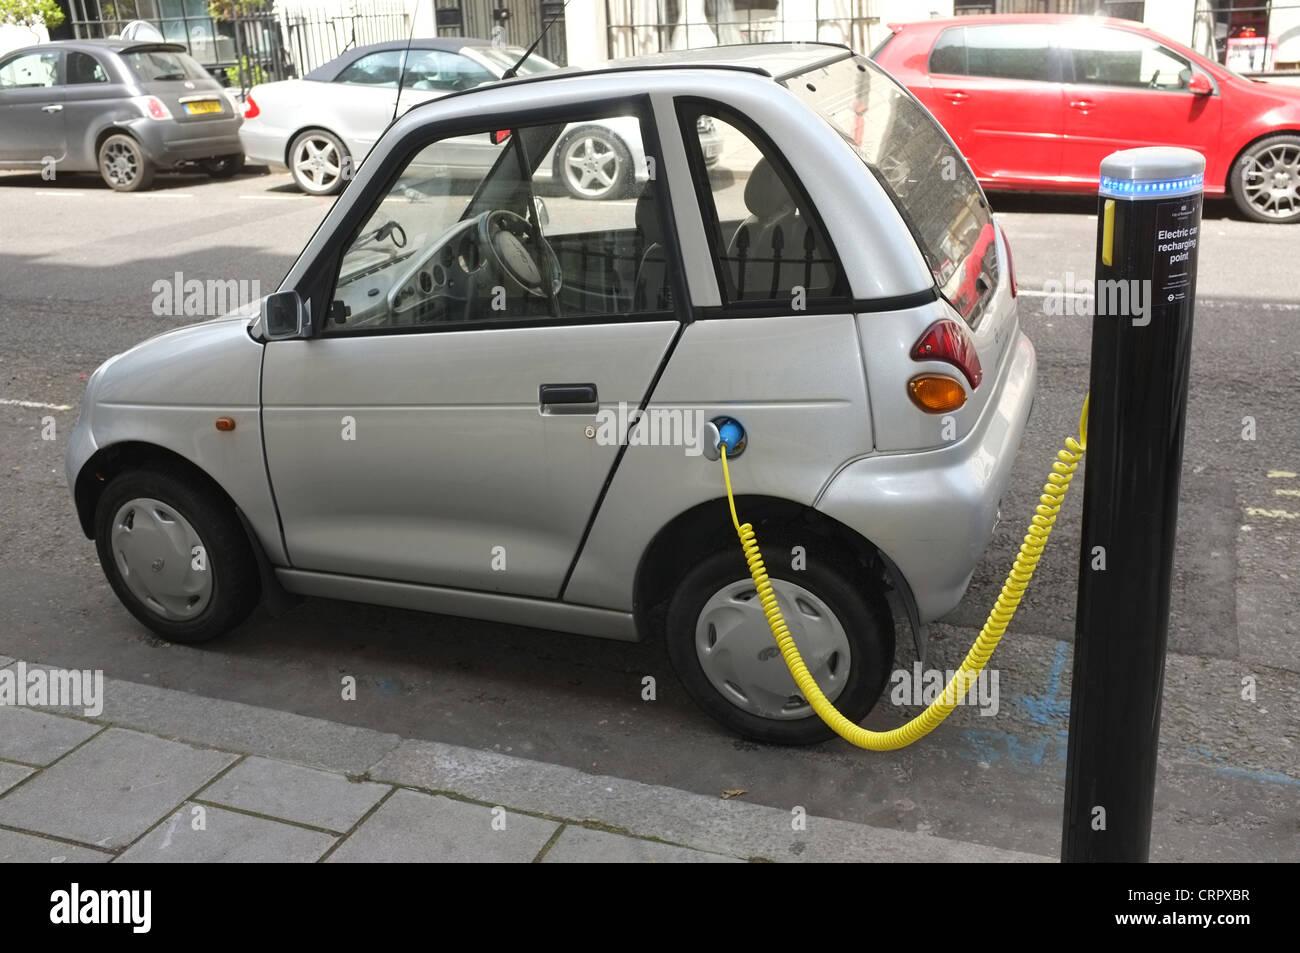 Un G-Wiz coche eléctrico conectado a un punto de recarga en la calle Hinde Westminster Imagen De Stock